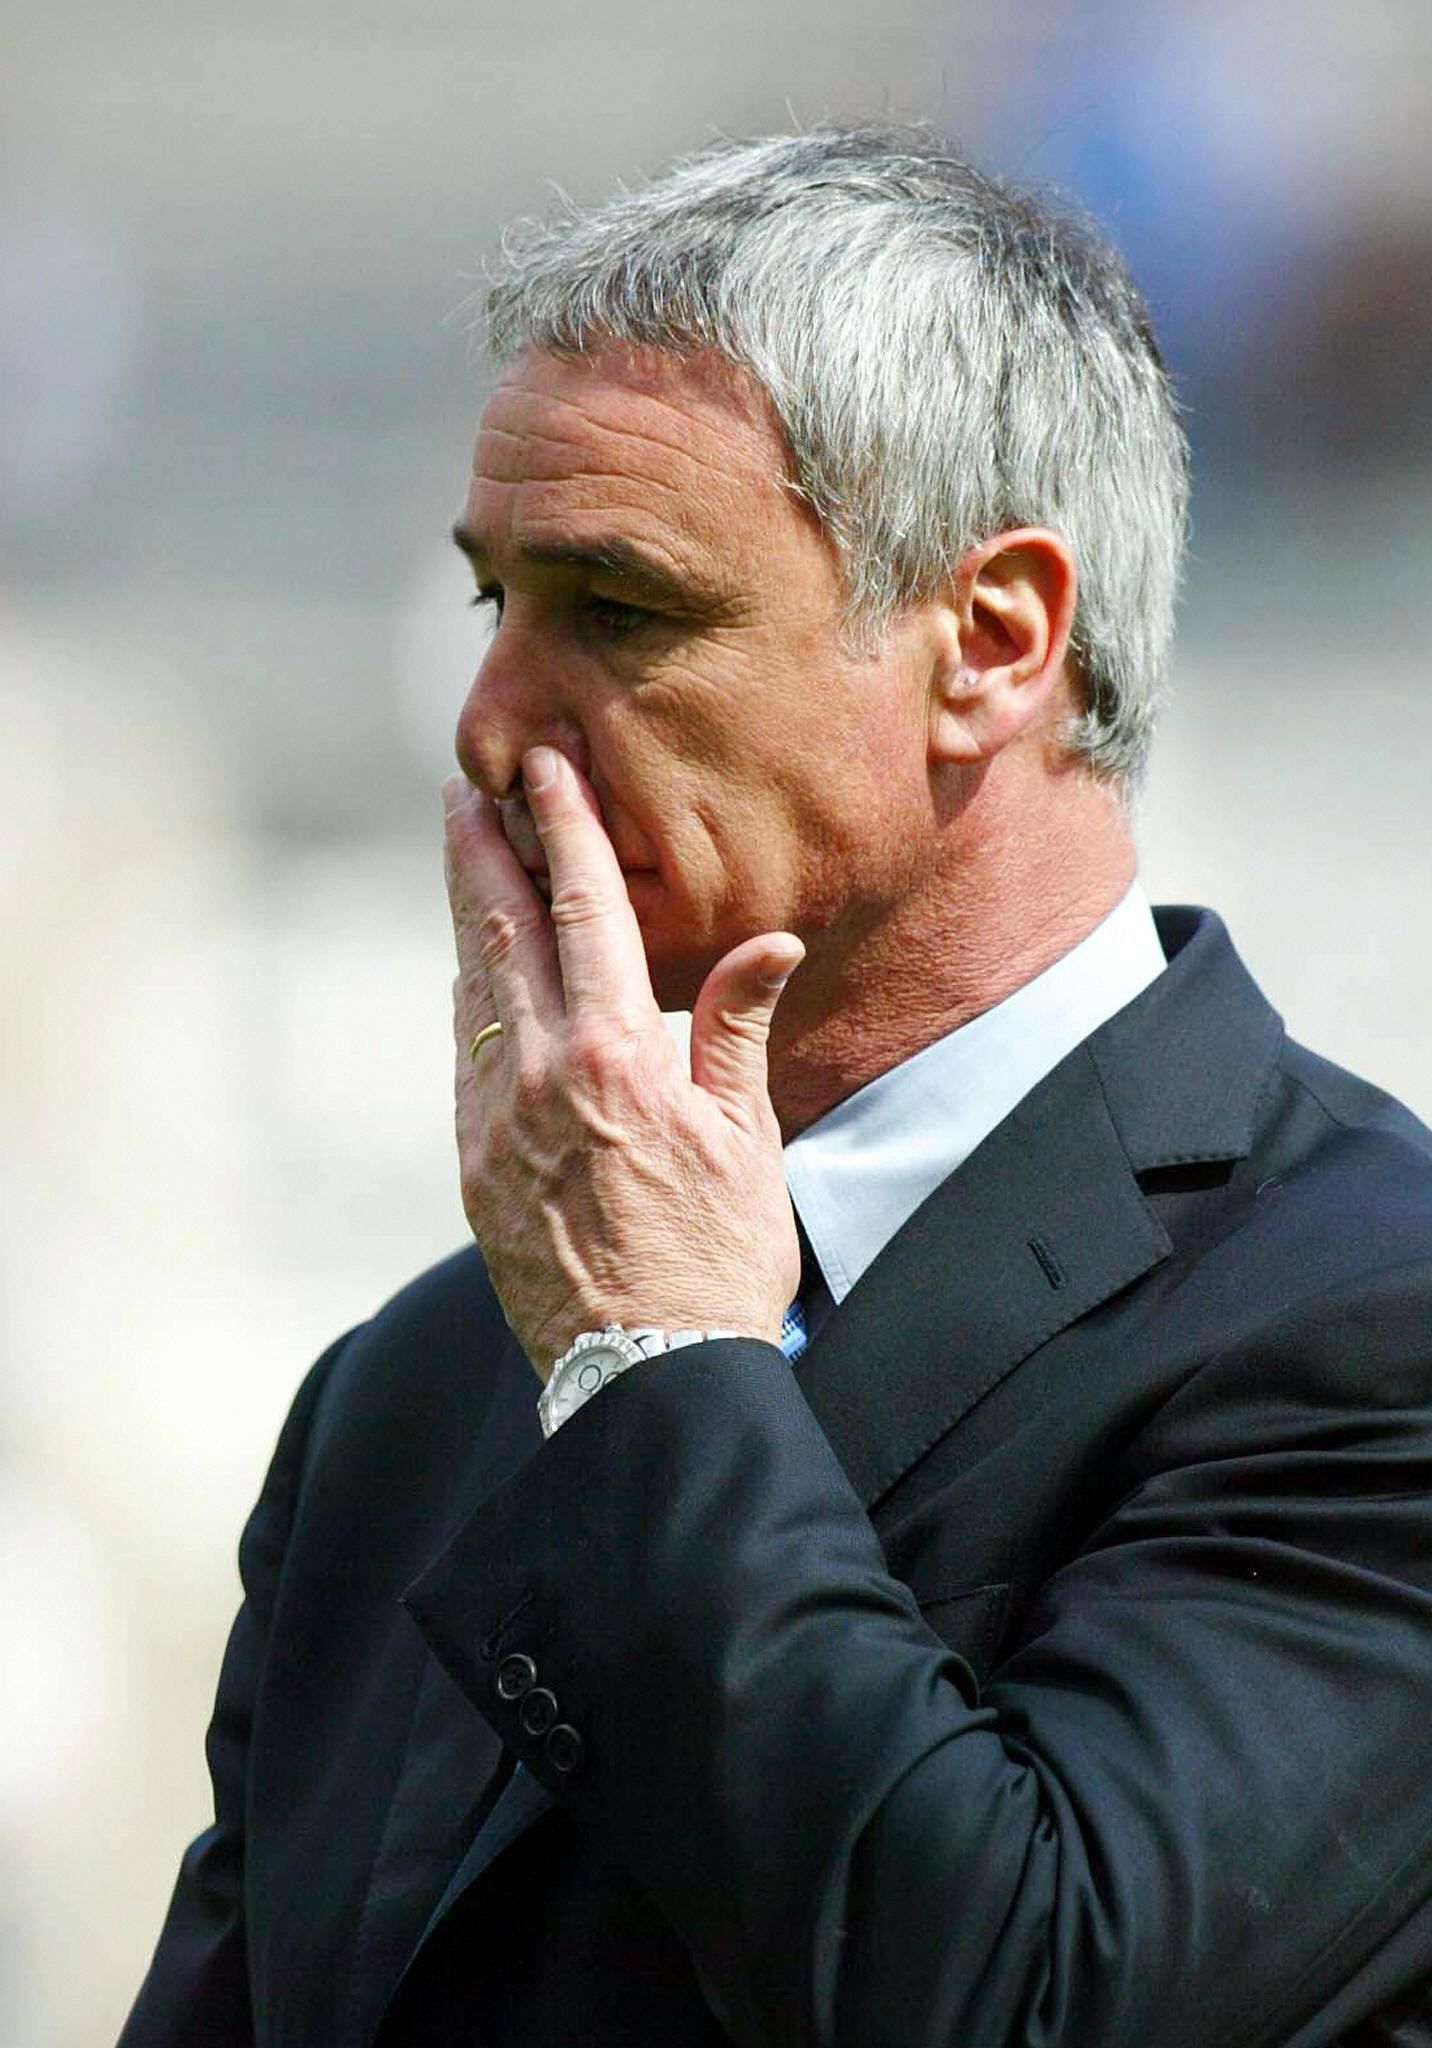 Claudio Ranieri has never won a major league title in his career.